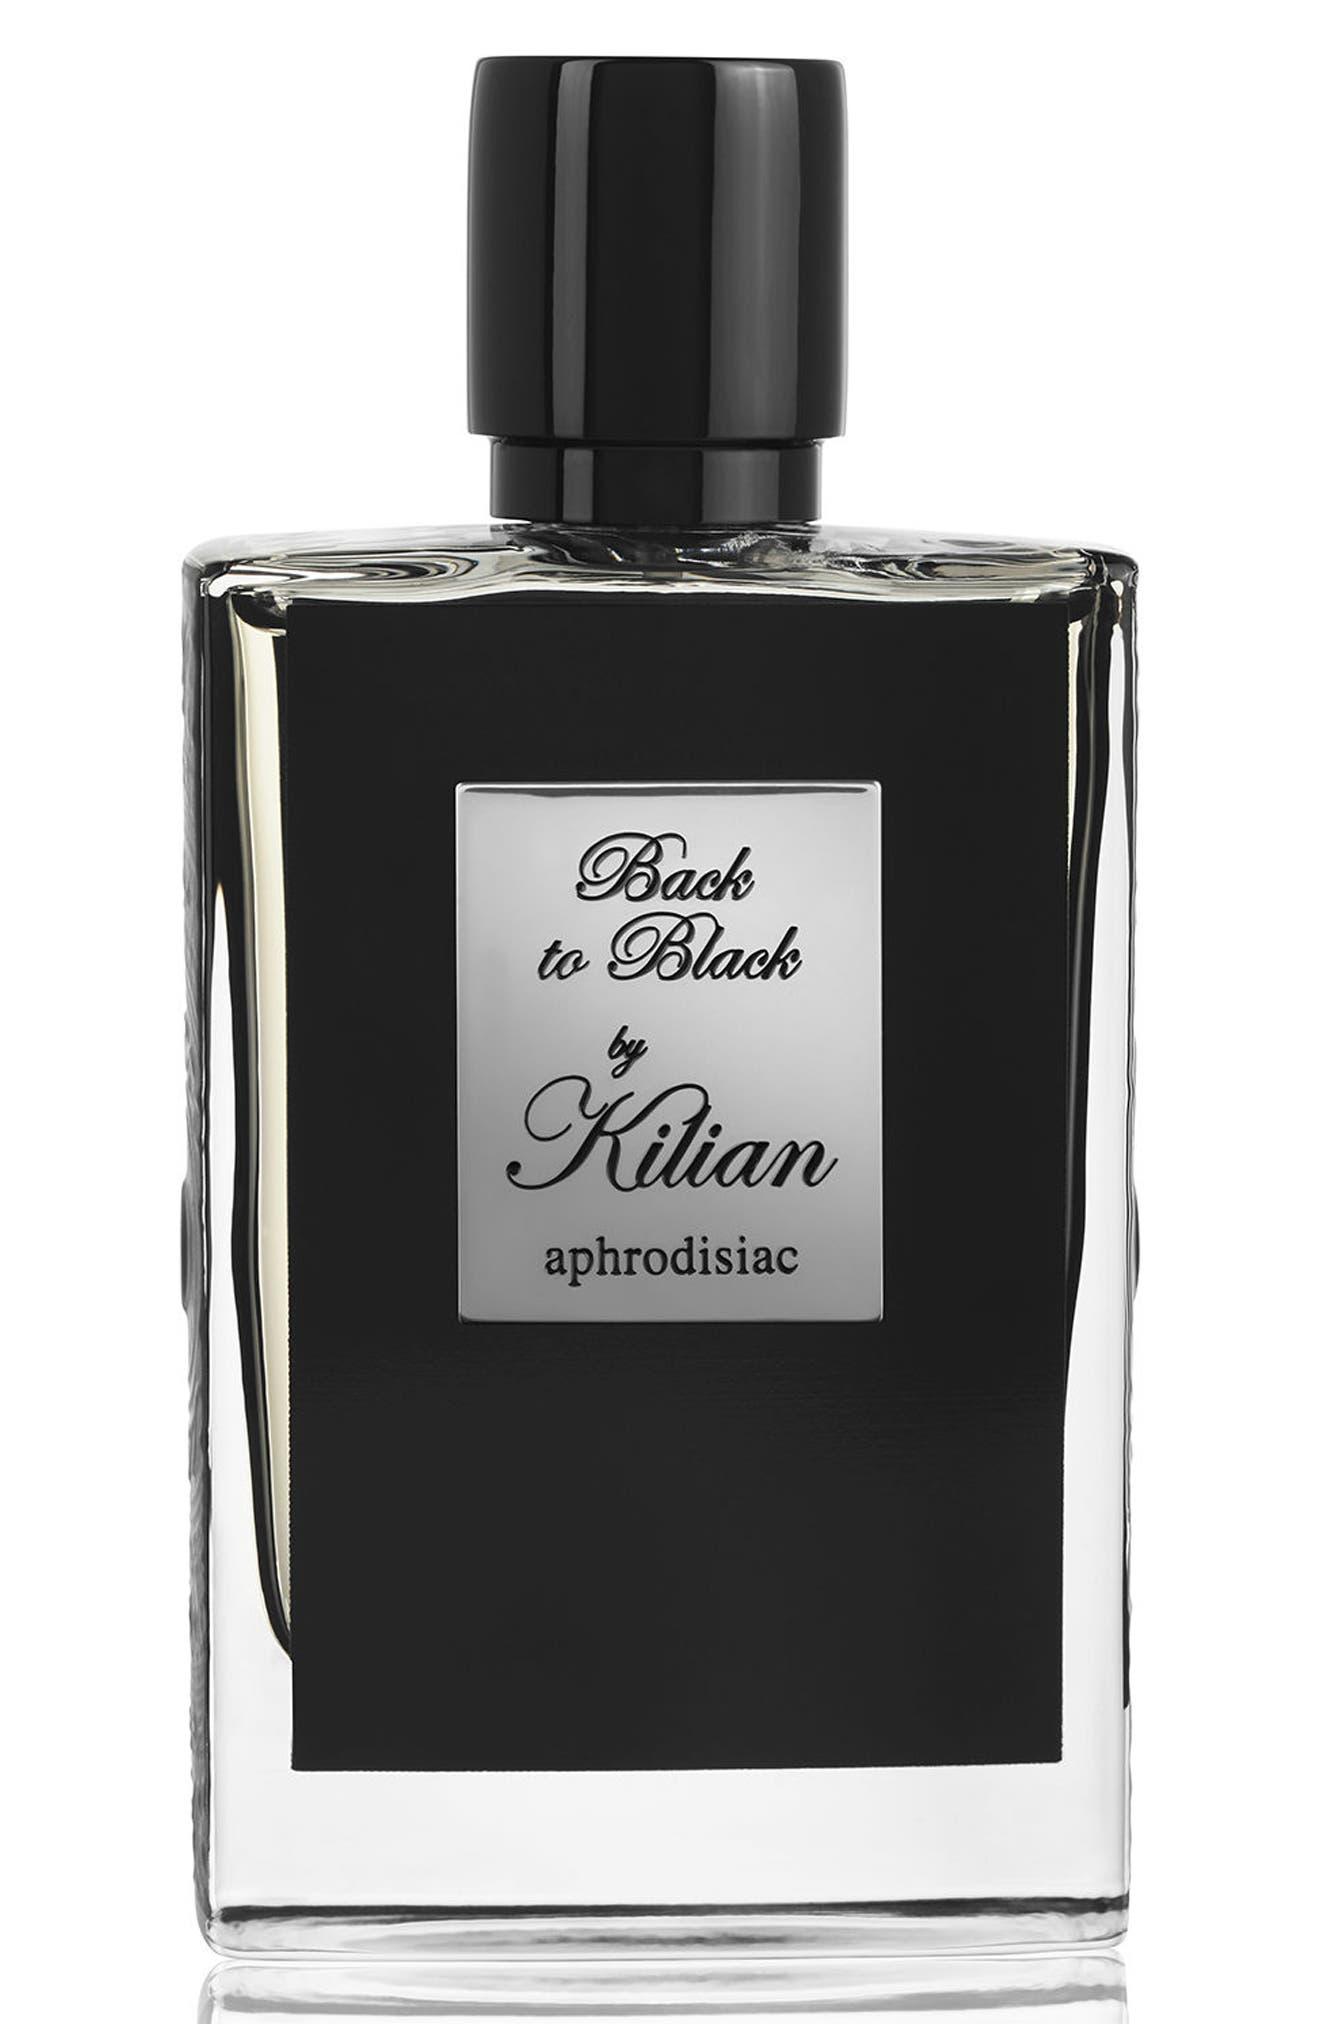 KILIAN LOeuvre Noire - Back to Black, aphrodisiac Refillable Fragrance Spray, Main, color, NO COLOR